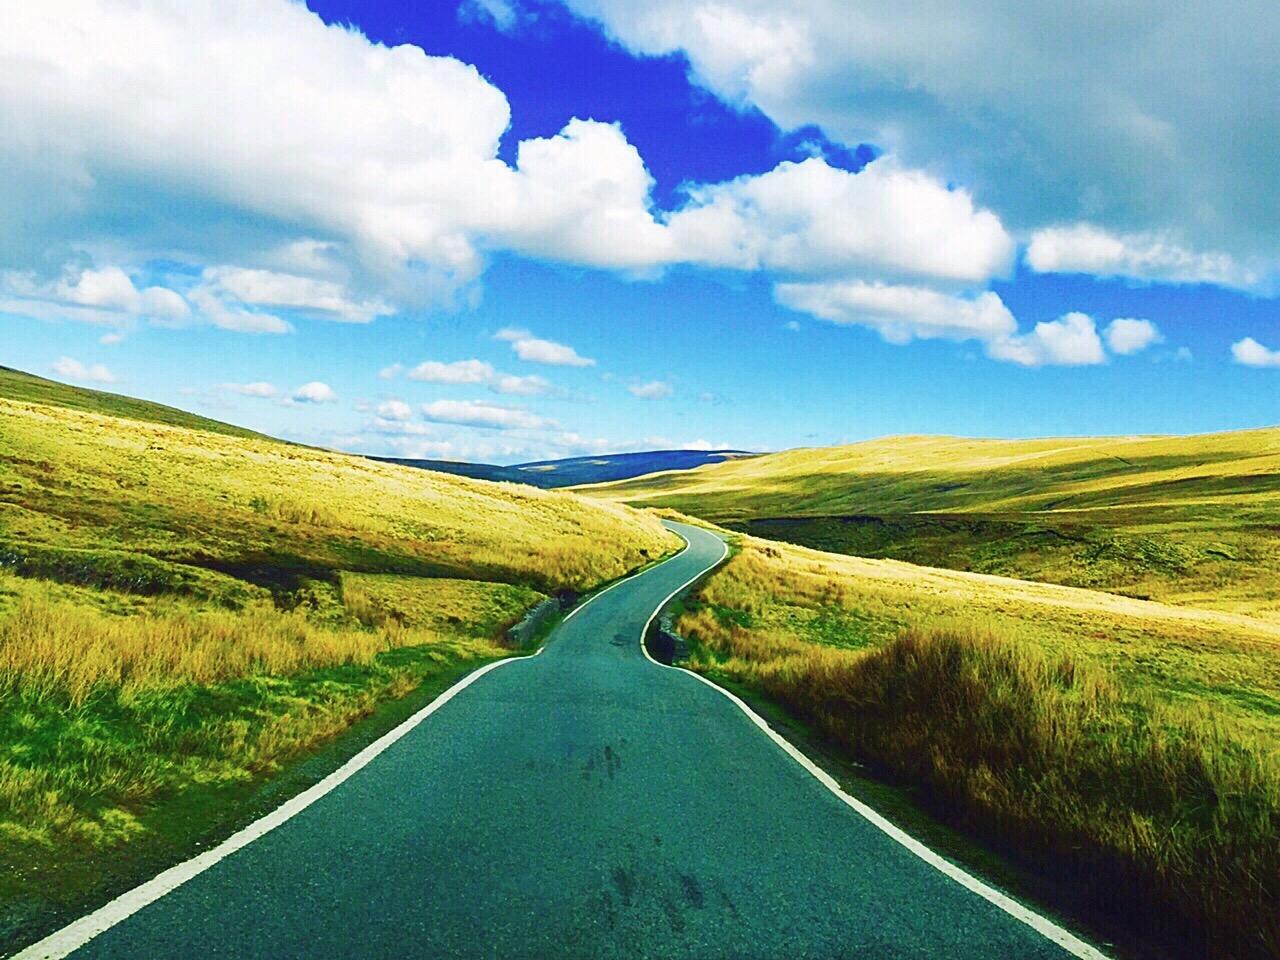 https://watt.co.uk/wp-content/uploads/2020/06/on-a-road-trip-to-countryside-in-uk_t20_yRwLz6.jpg